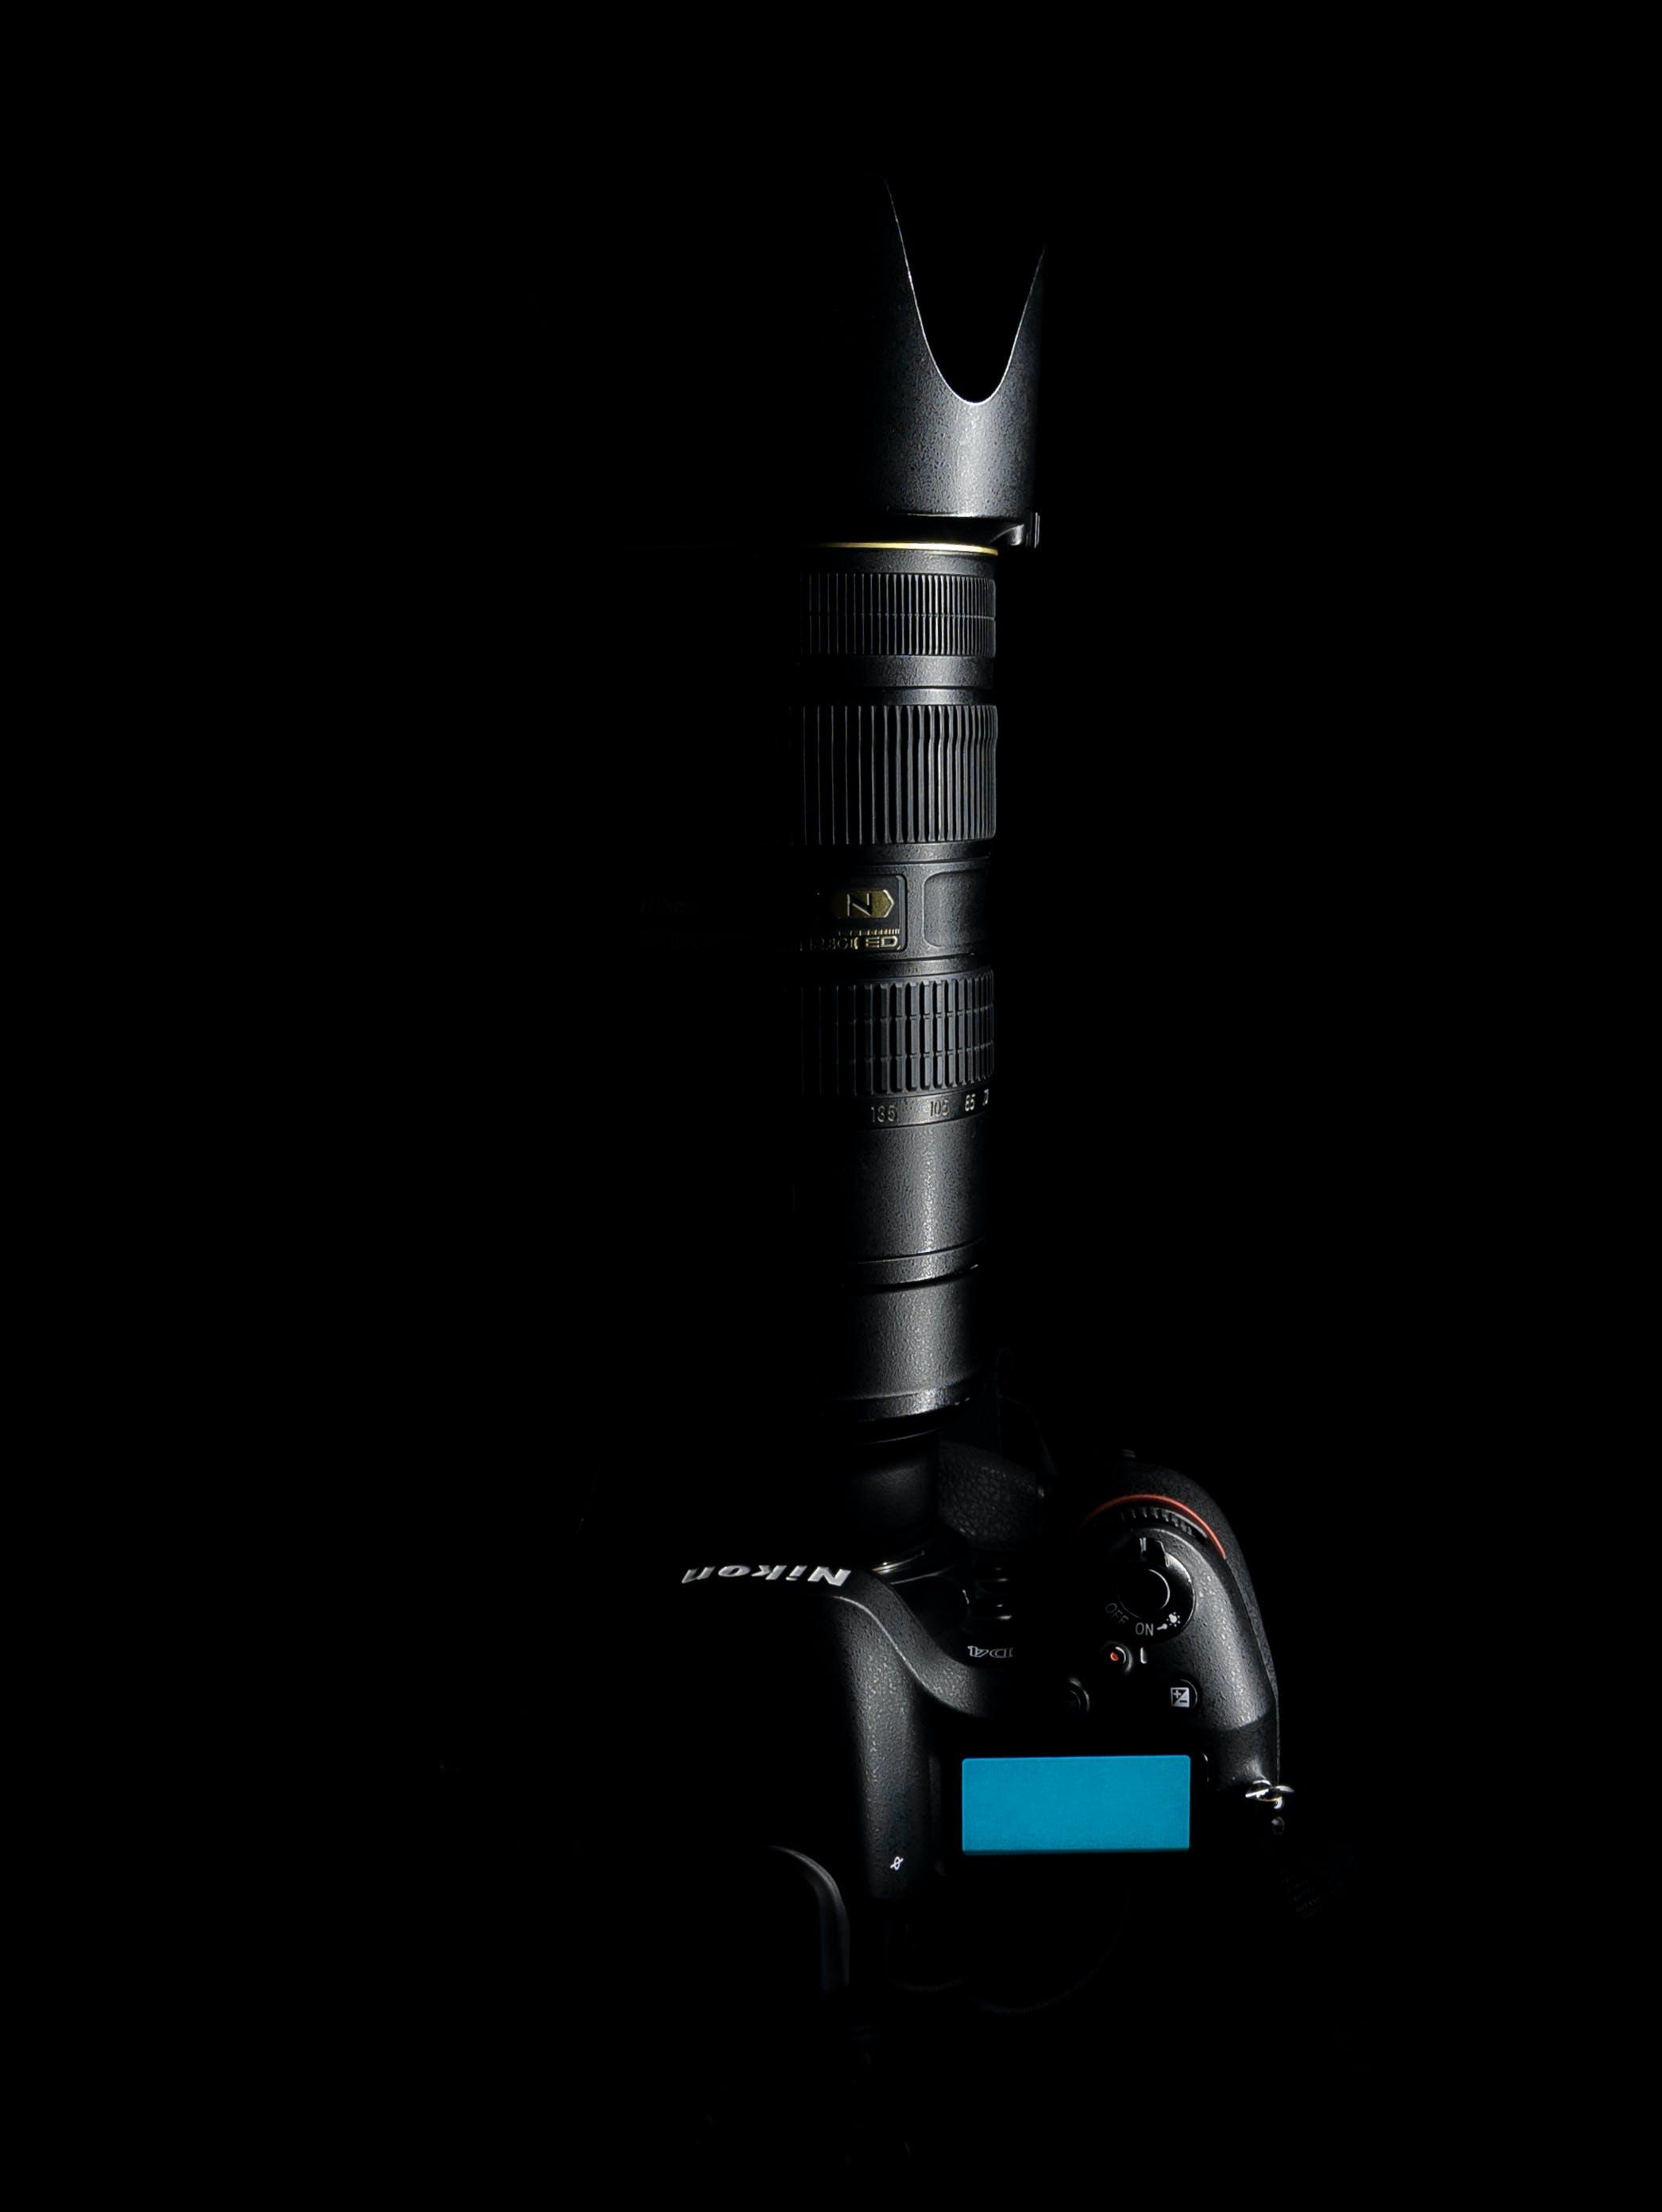 Top View Photo of Nikon Camera